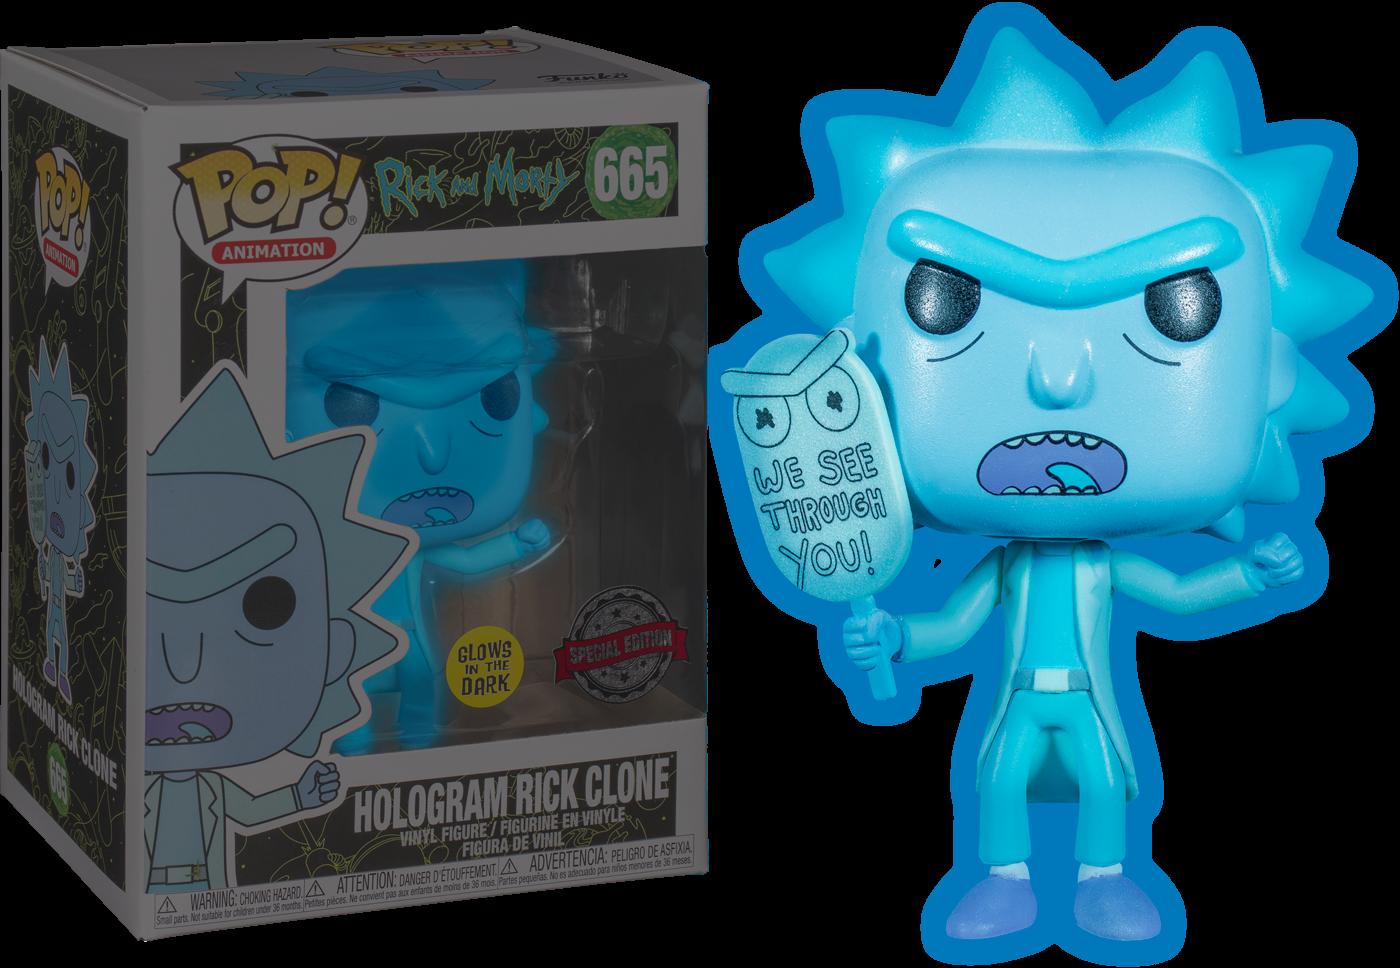 Rick & Morty - Hologram Rick (See You) Glow  Exclusive Pop! Vinyl Figure